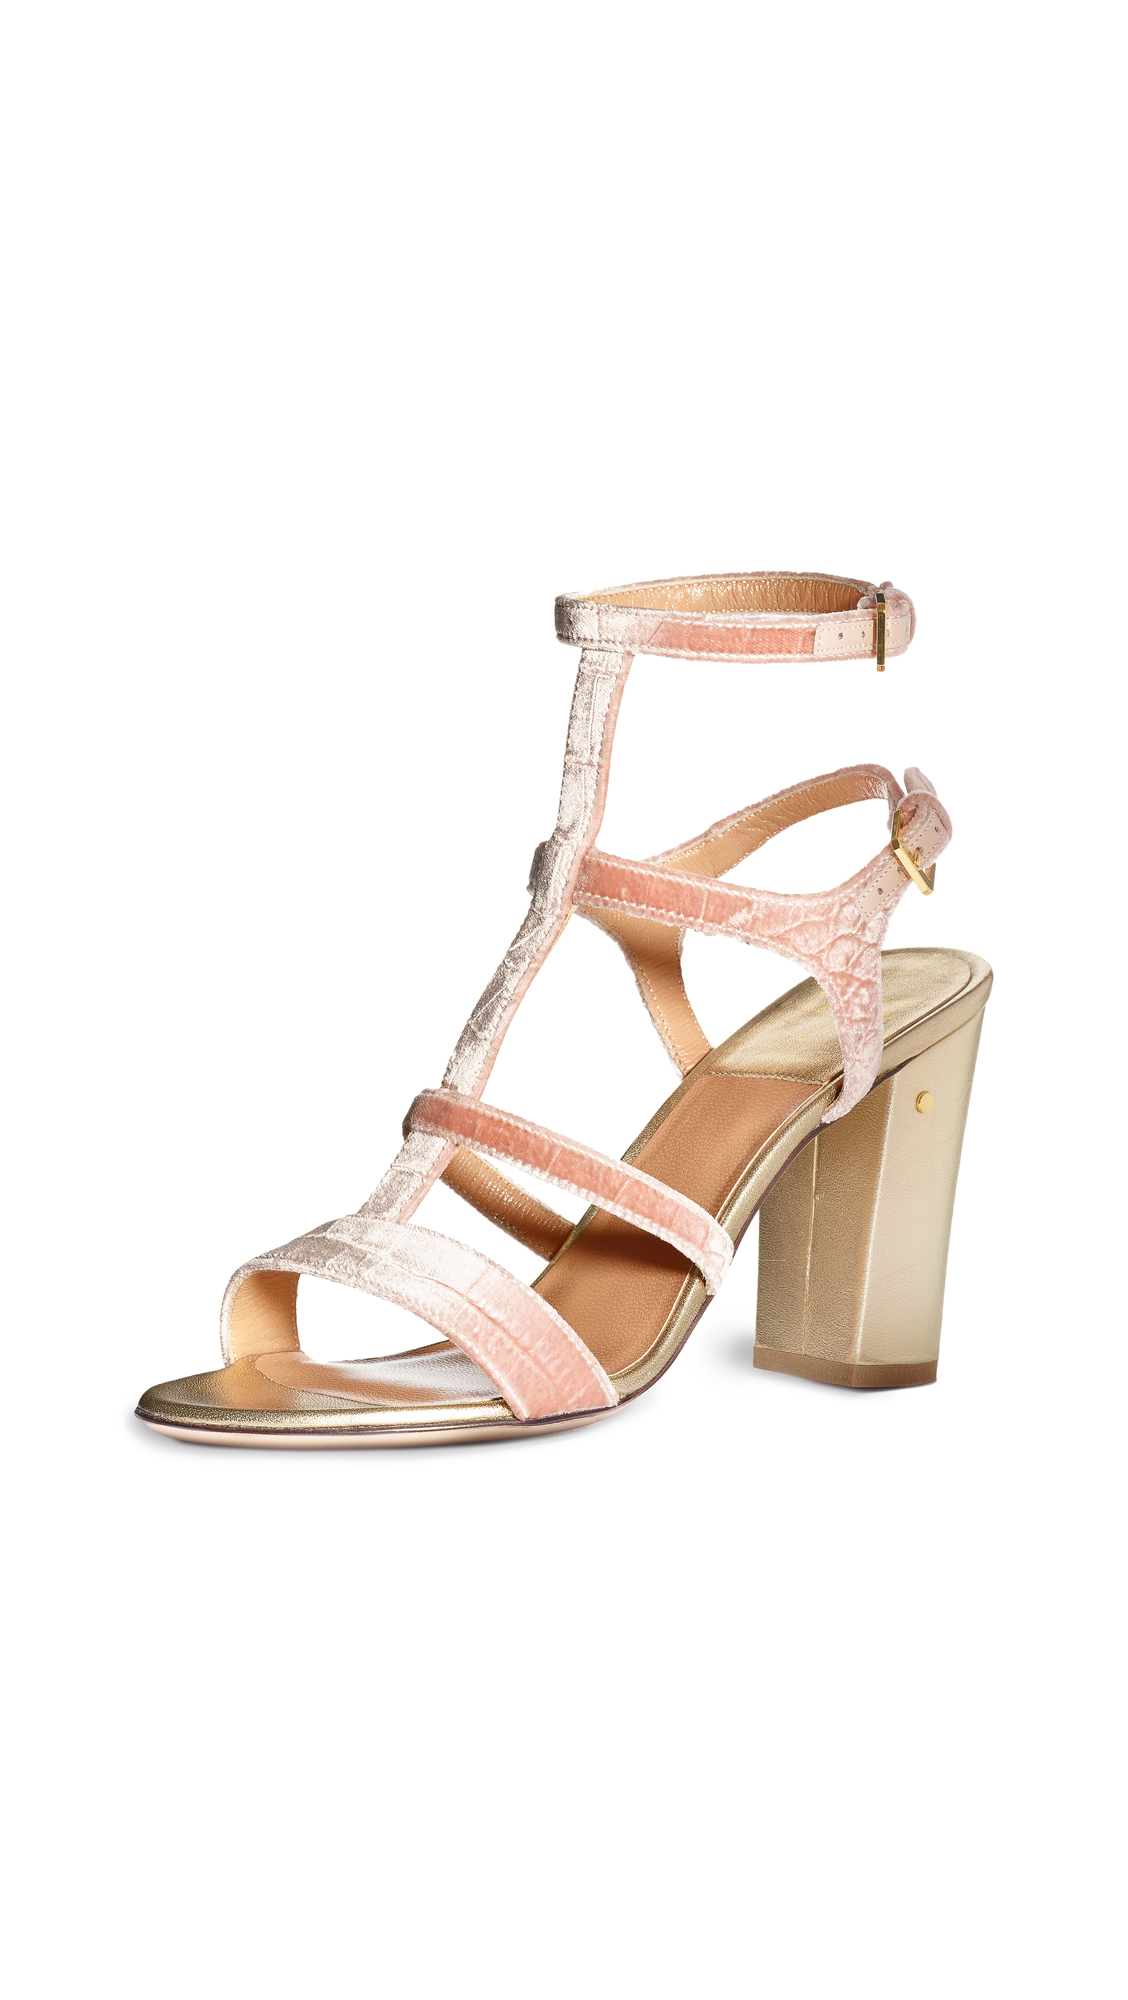 Laurence Dacade Leonie Sandals - 50% Off Sale